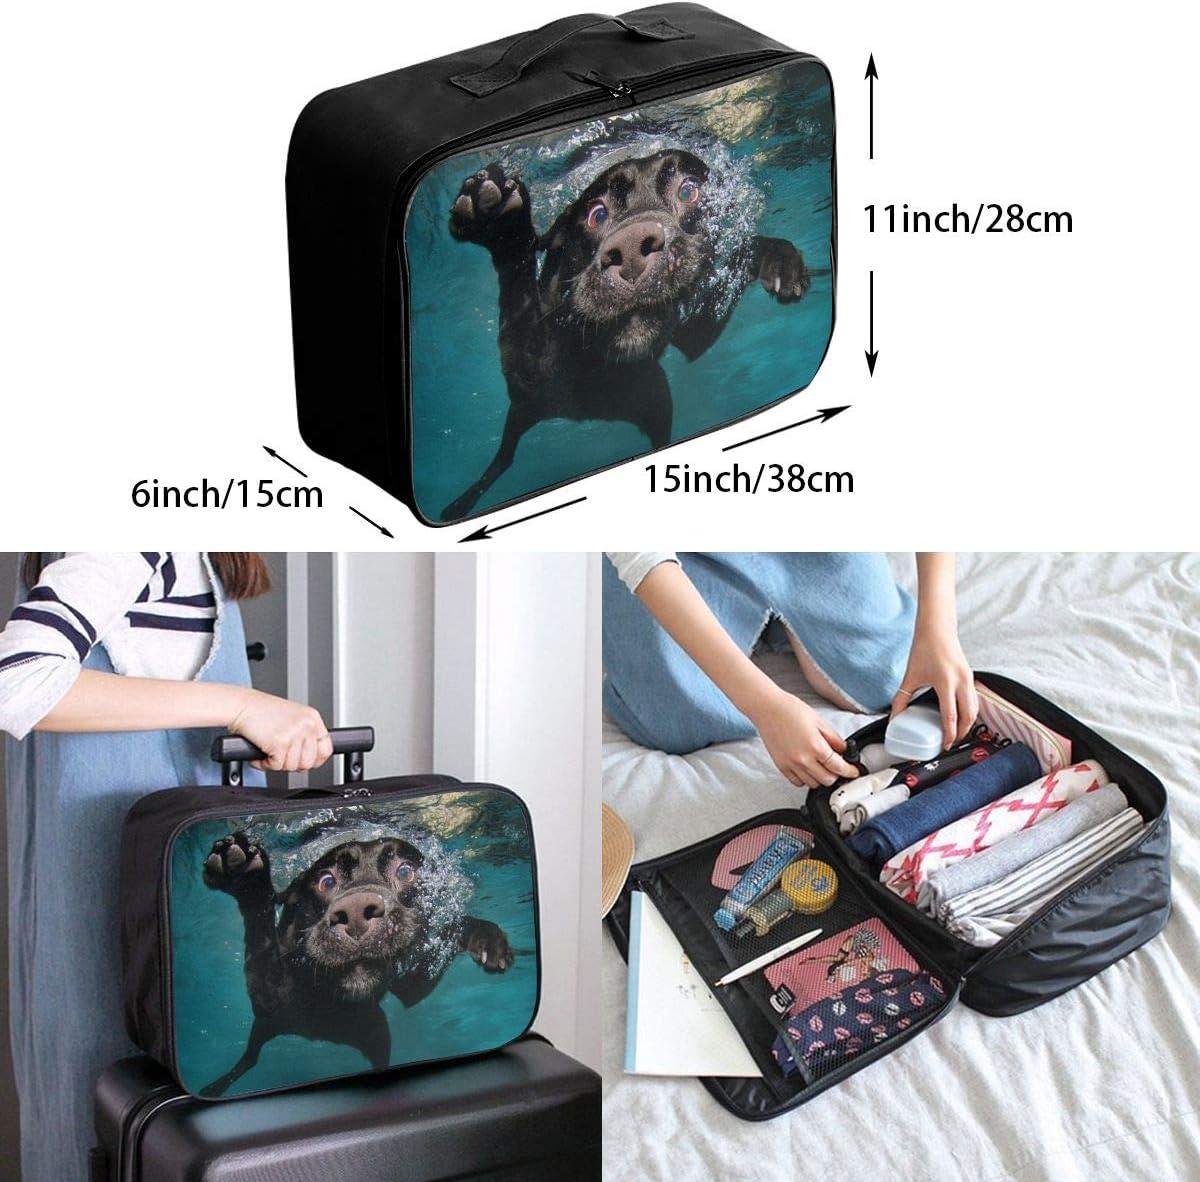 Cute Underwater Puppies Travel Carry-on Luggage Weekender Bag Overnight Tote Flight Duffel In Trolley Handle